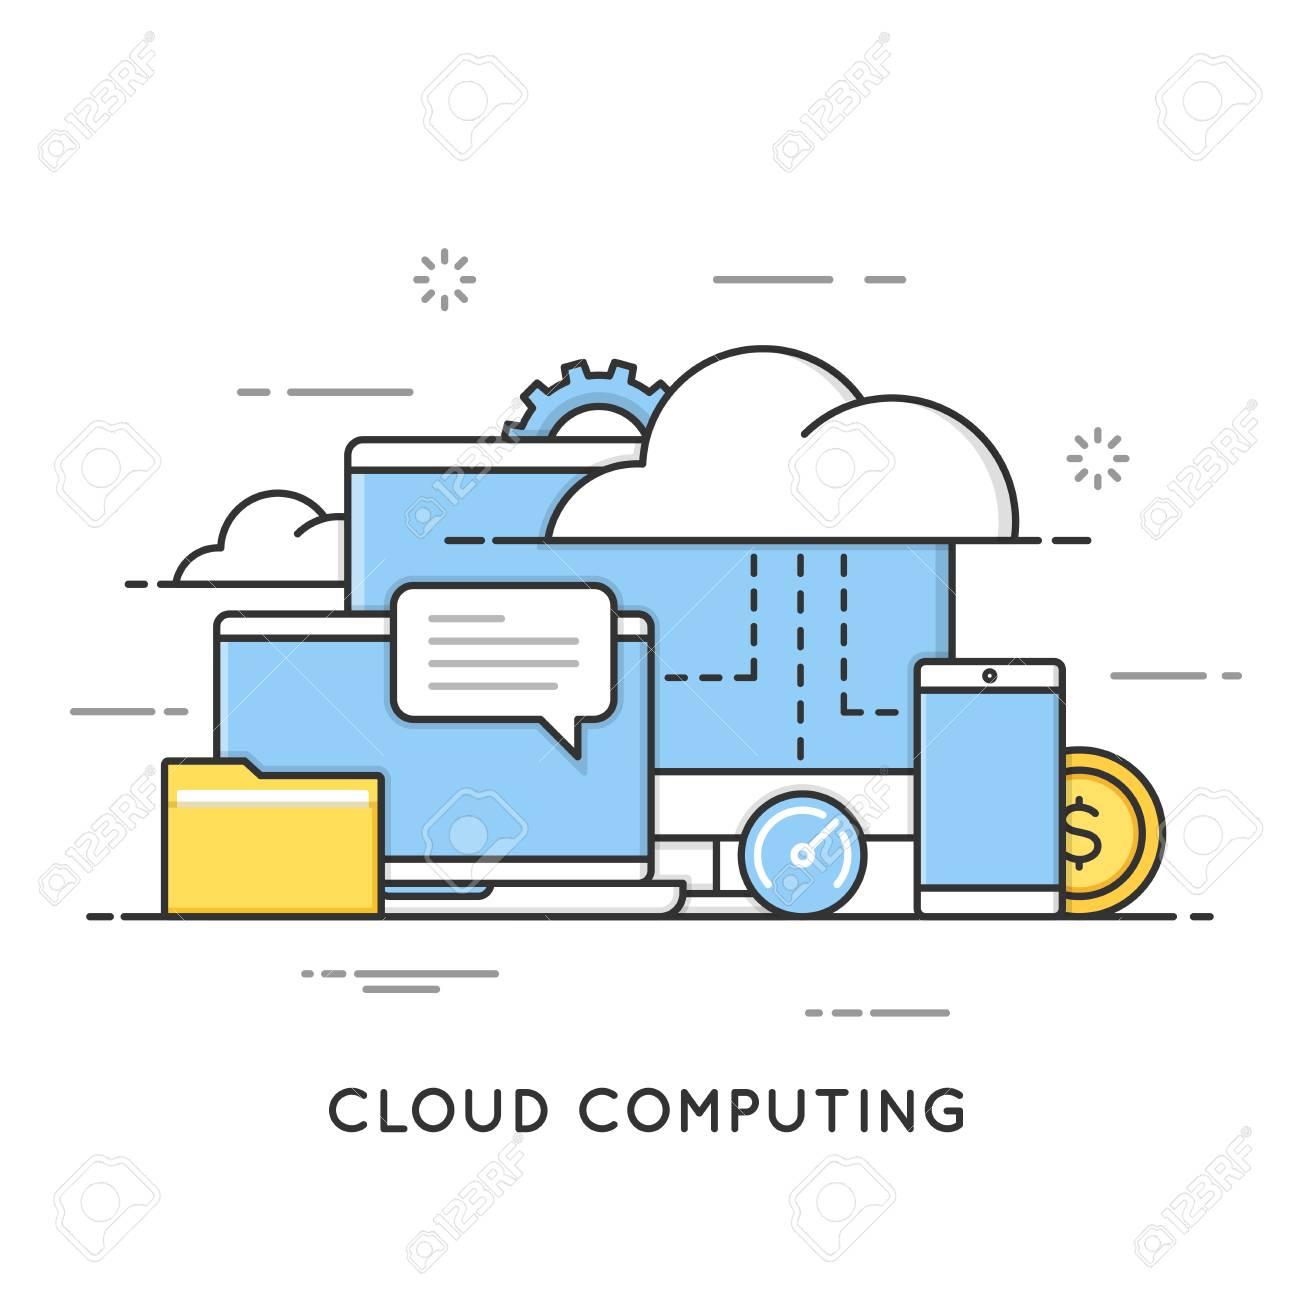 Cloud computing, data storage, web services. Flat line art style concept. Editable stroke. - 85064720